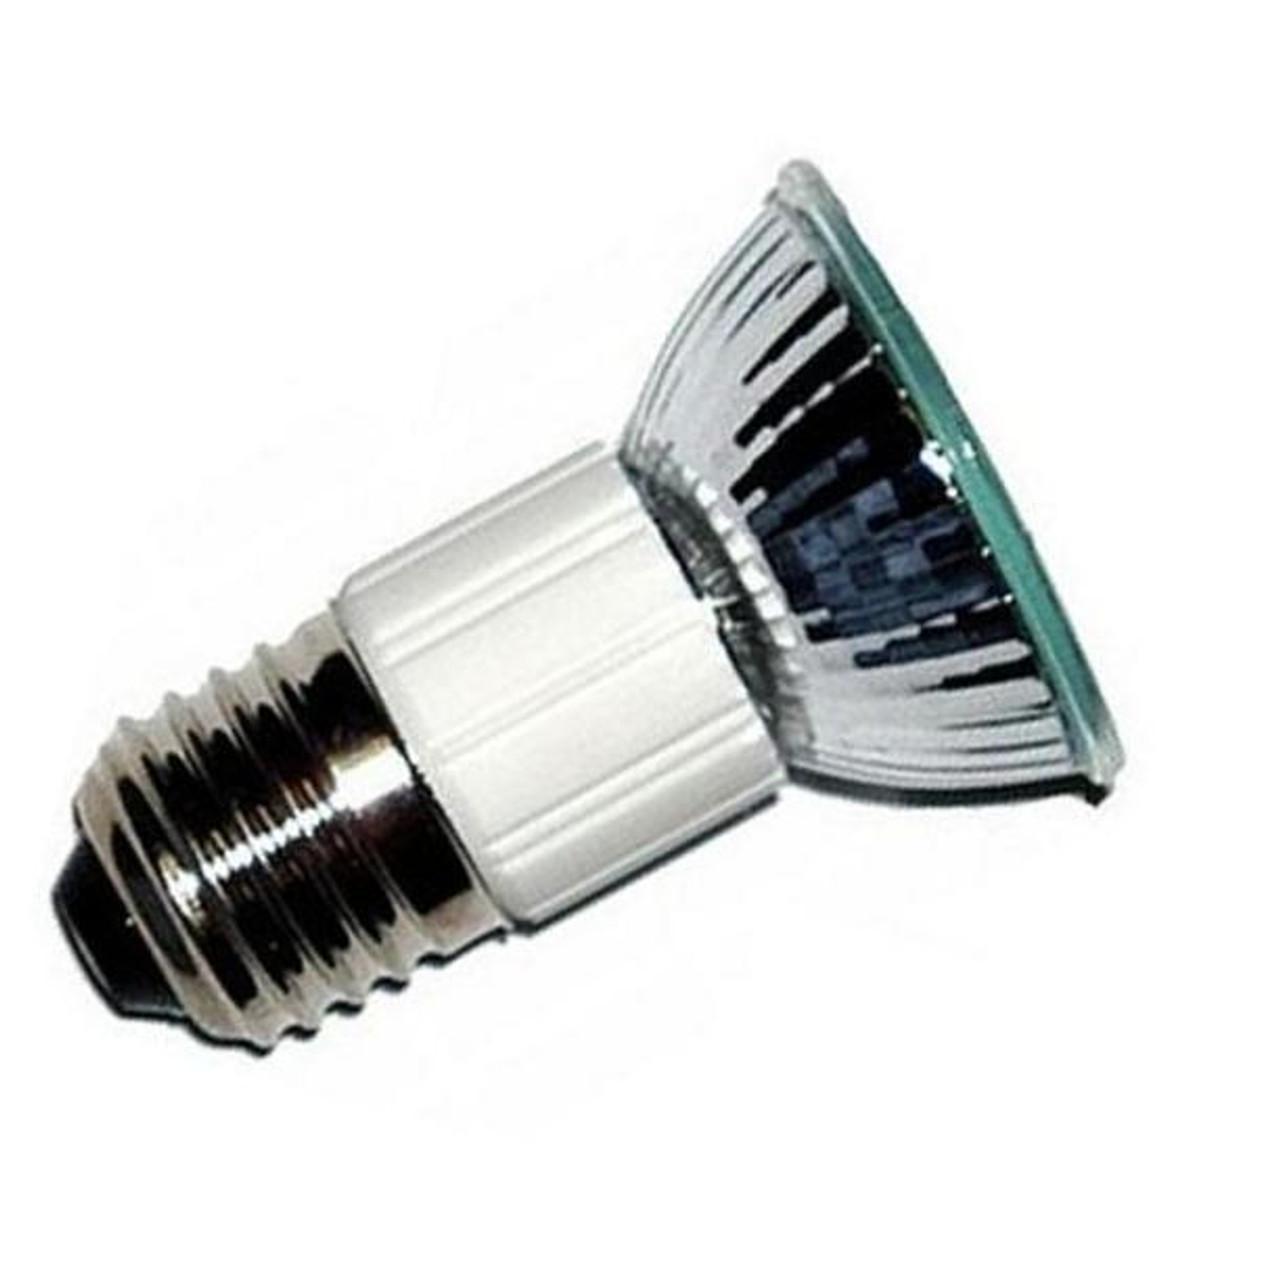 50 Watt Halogen bulb 120V 50W for Kitchen Hood GE WB08X10028